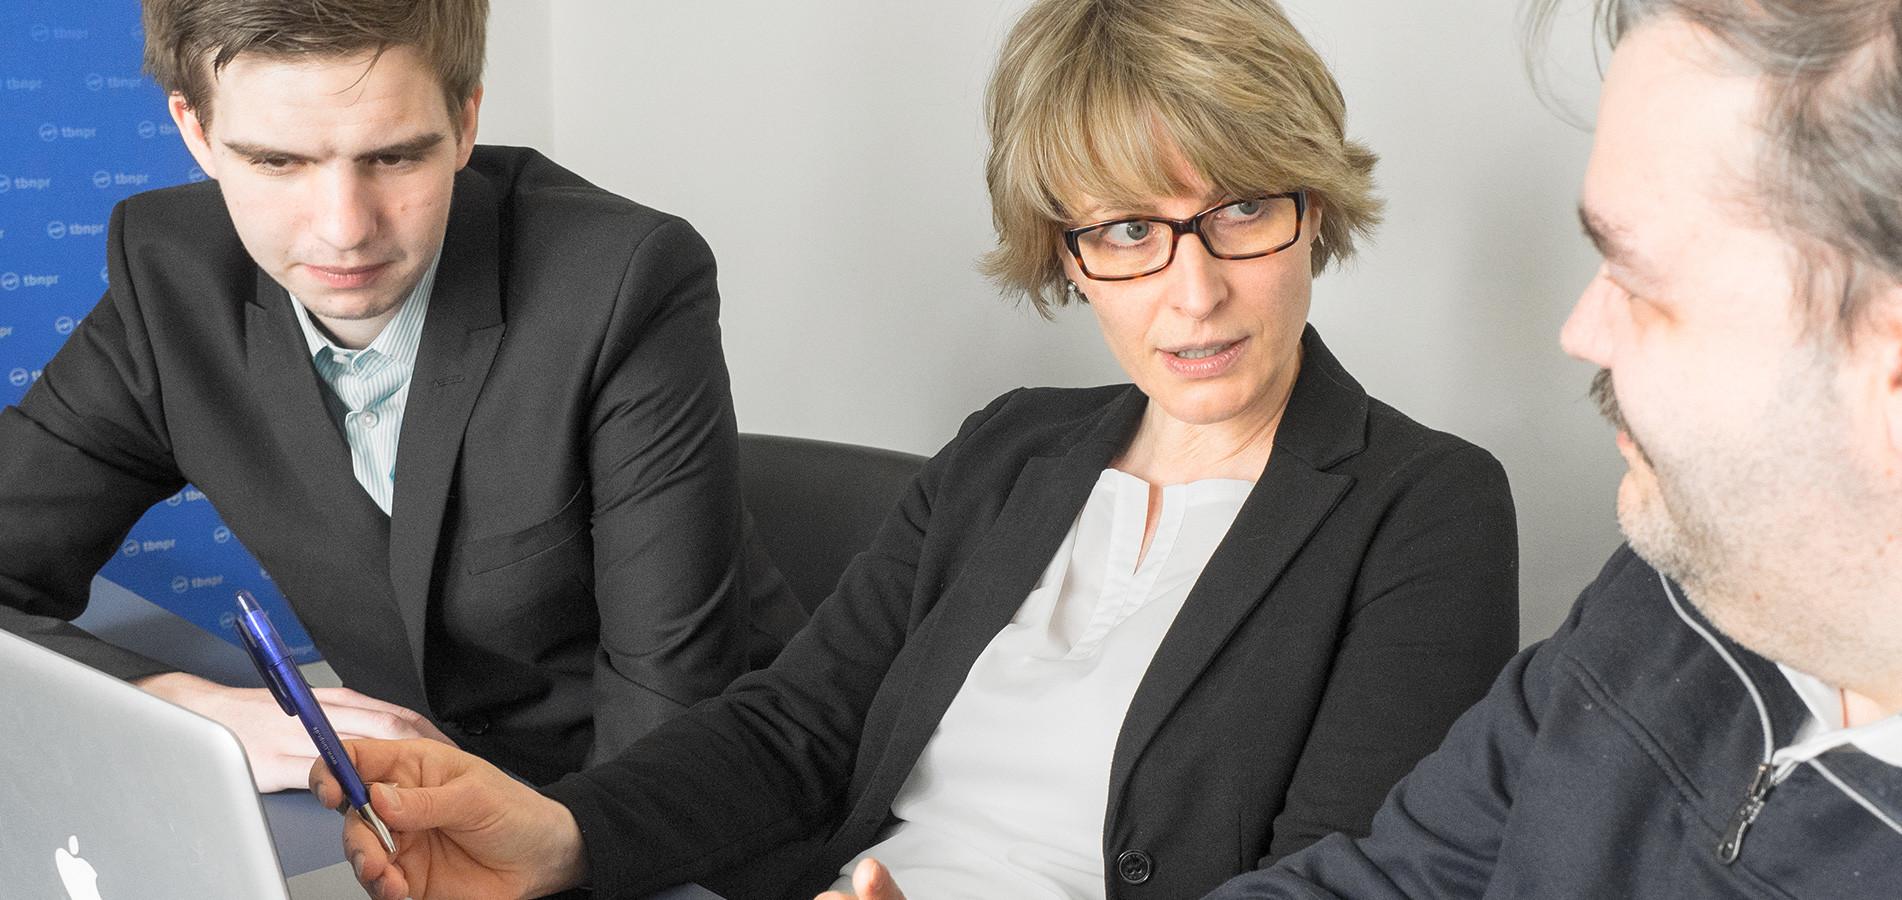 Lead Management Beratung von TBN Public Relations